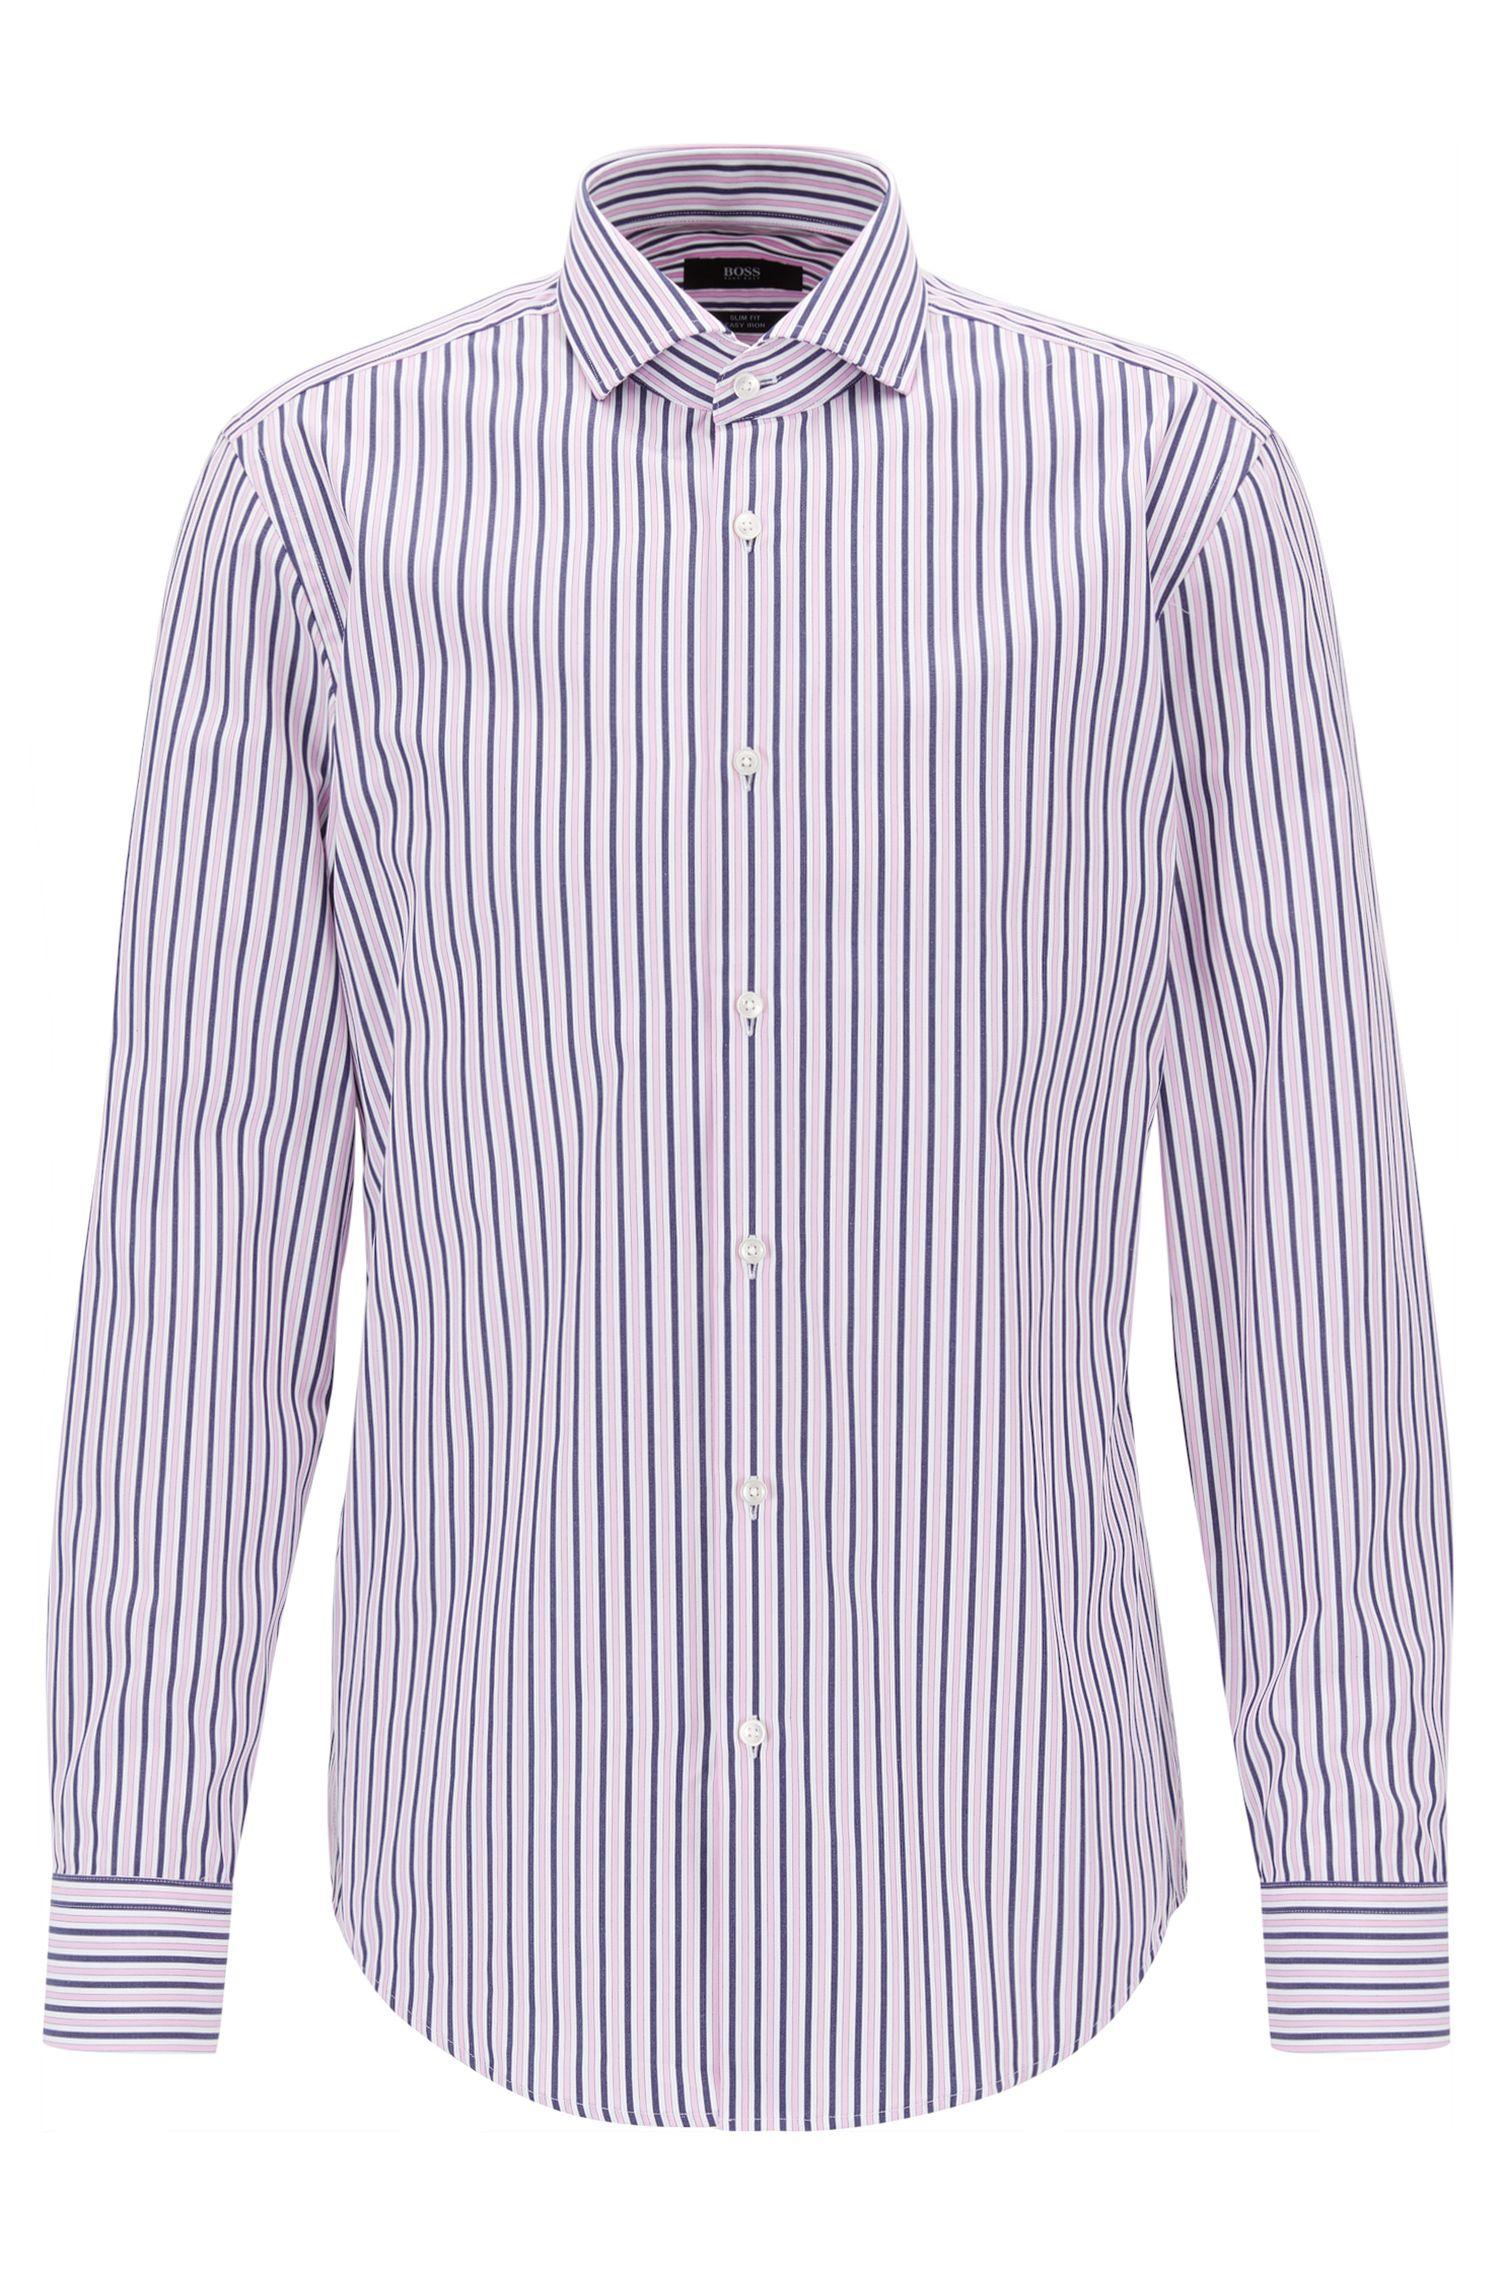 Striped Cotton Dress Shirt, Slim Fit | Jason, light pink